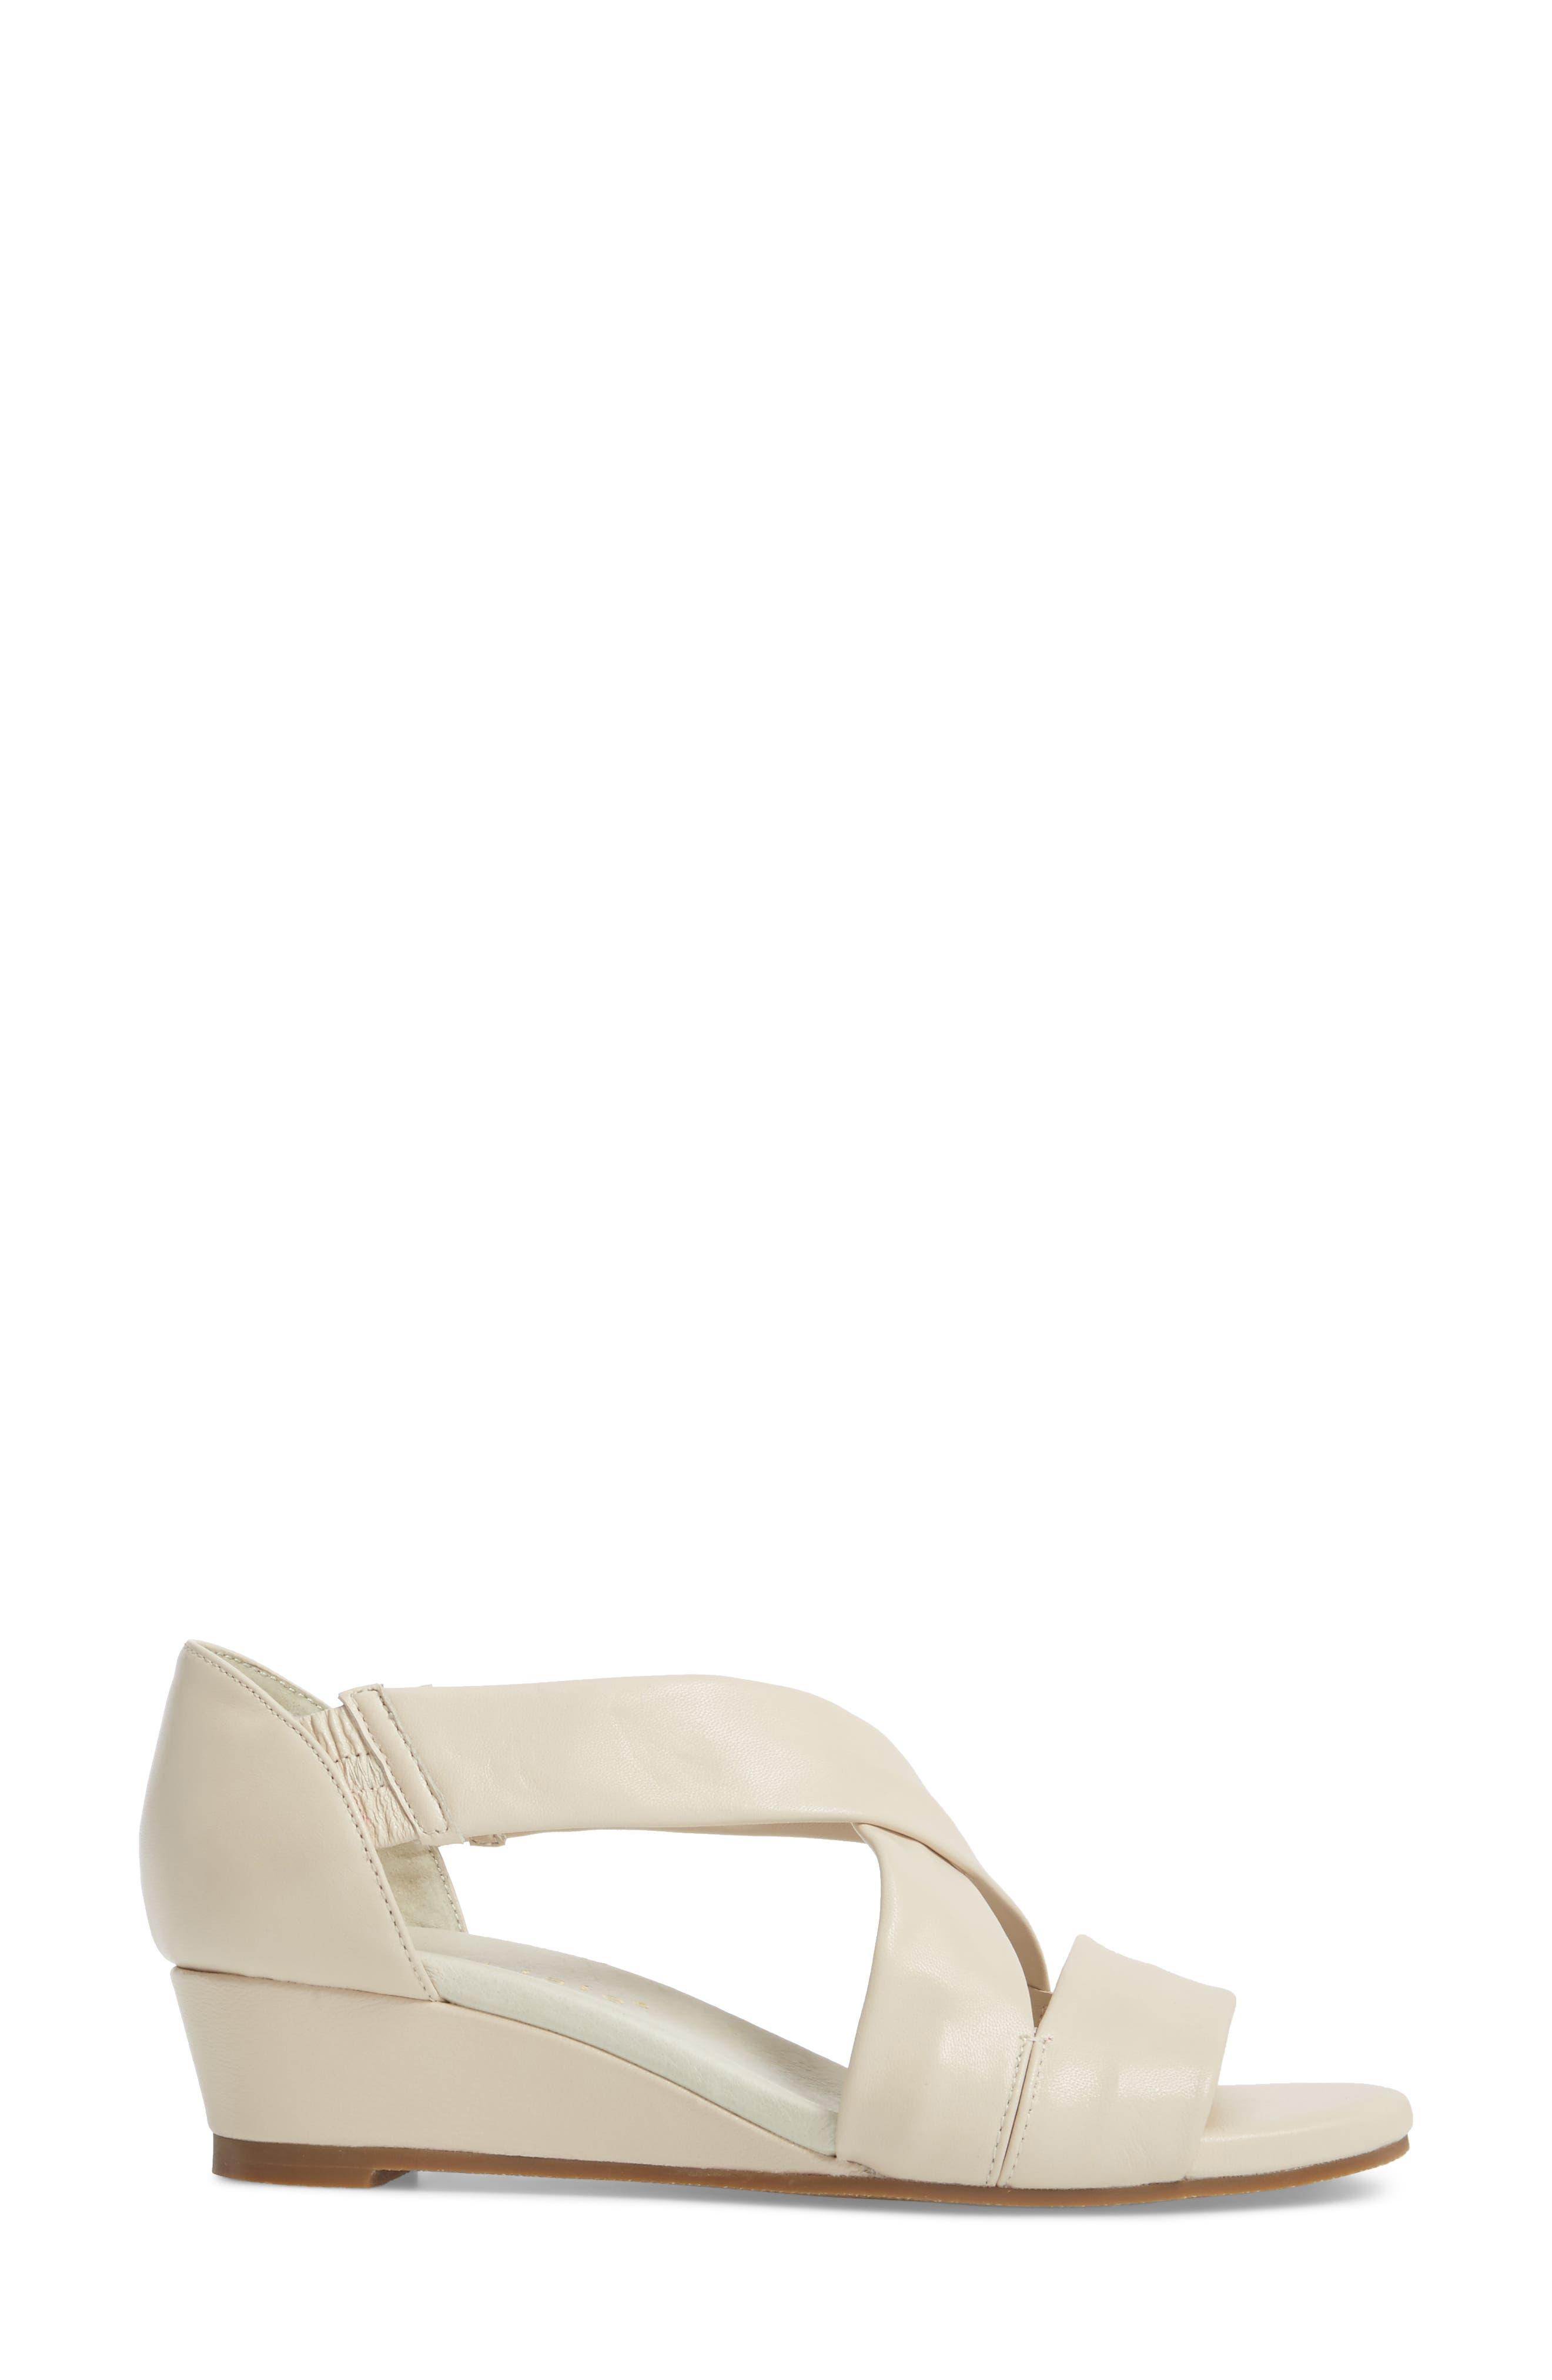 Swell Cross Strap Wedge Sandal,                             Alternate thumbnail 3, color,                             Bone Leather